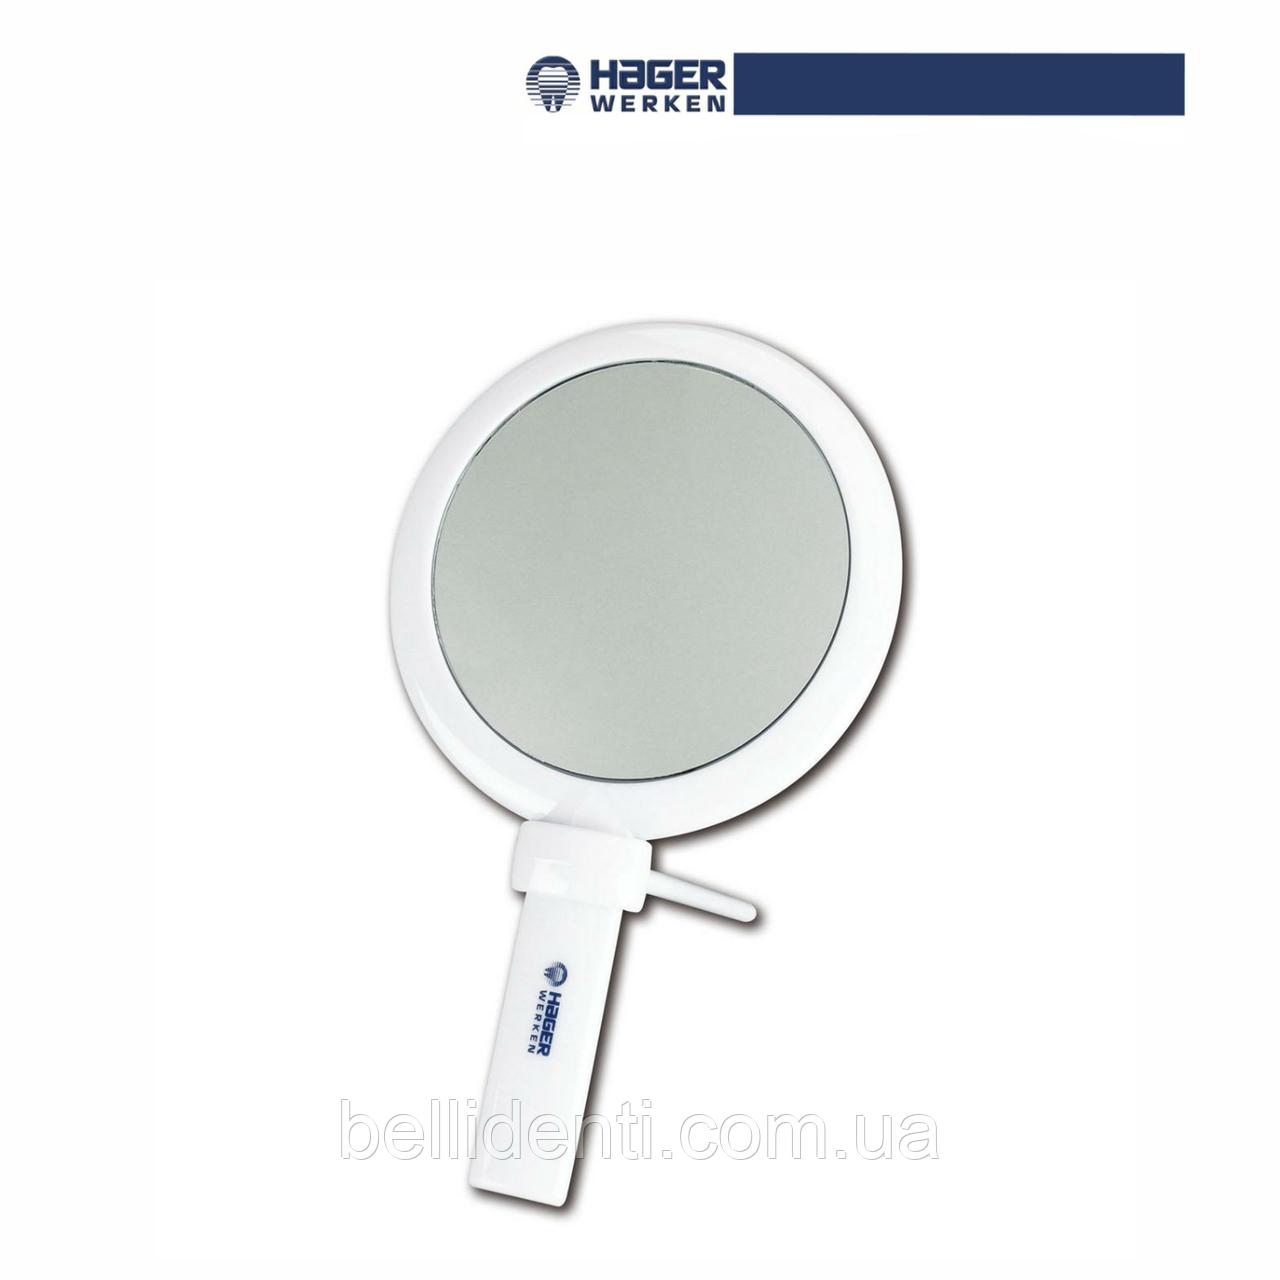 Двухстороннее зеркало для пациента miradent Mira-Duo, диаметр 13 см